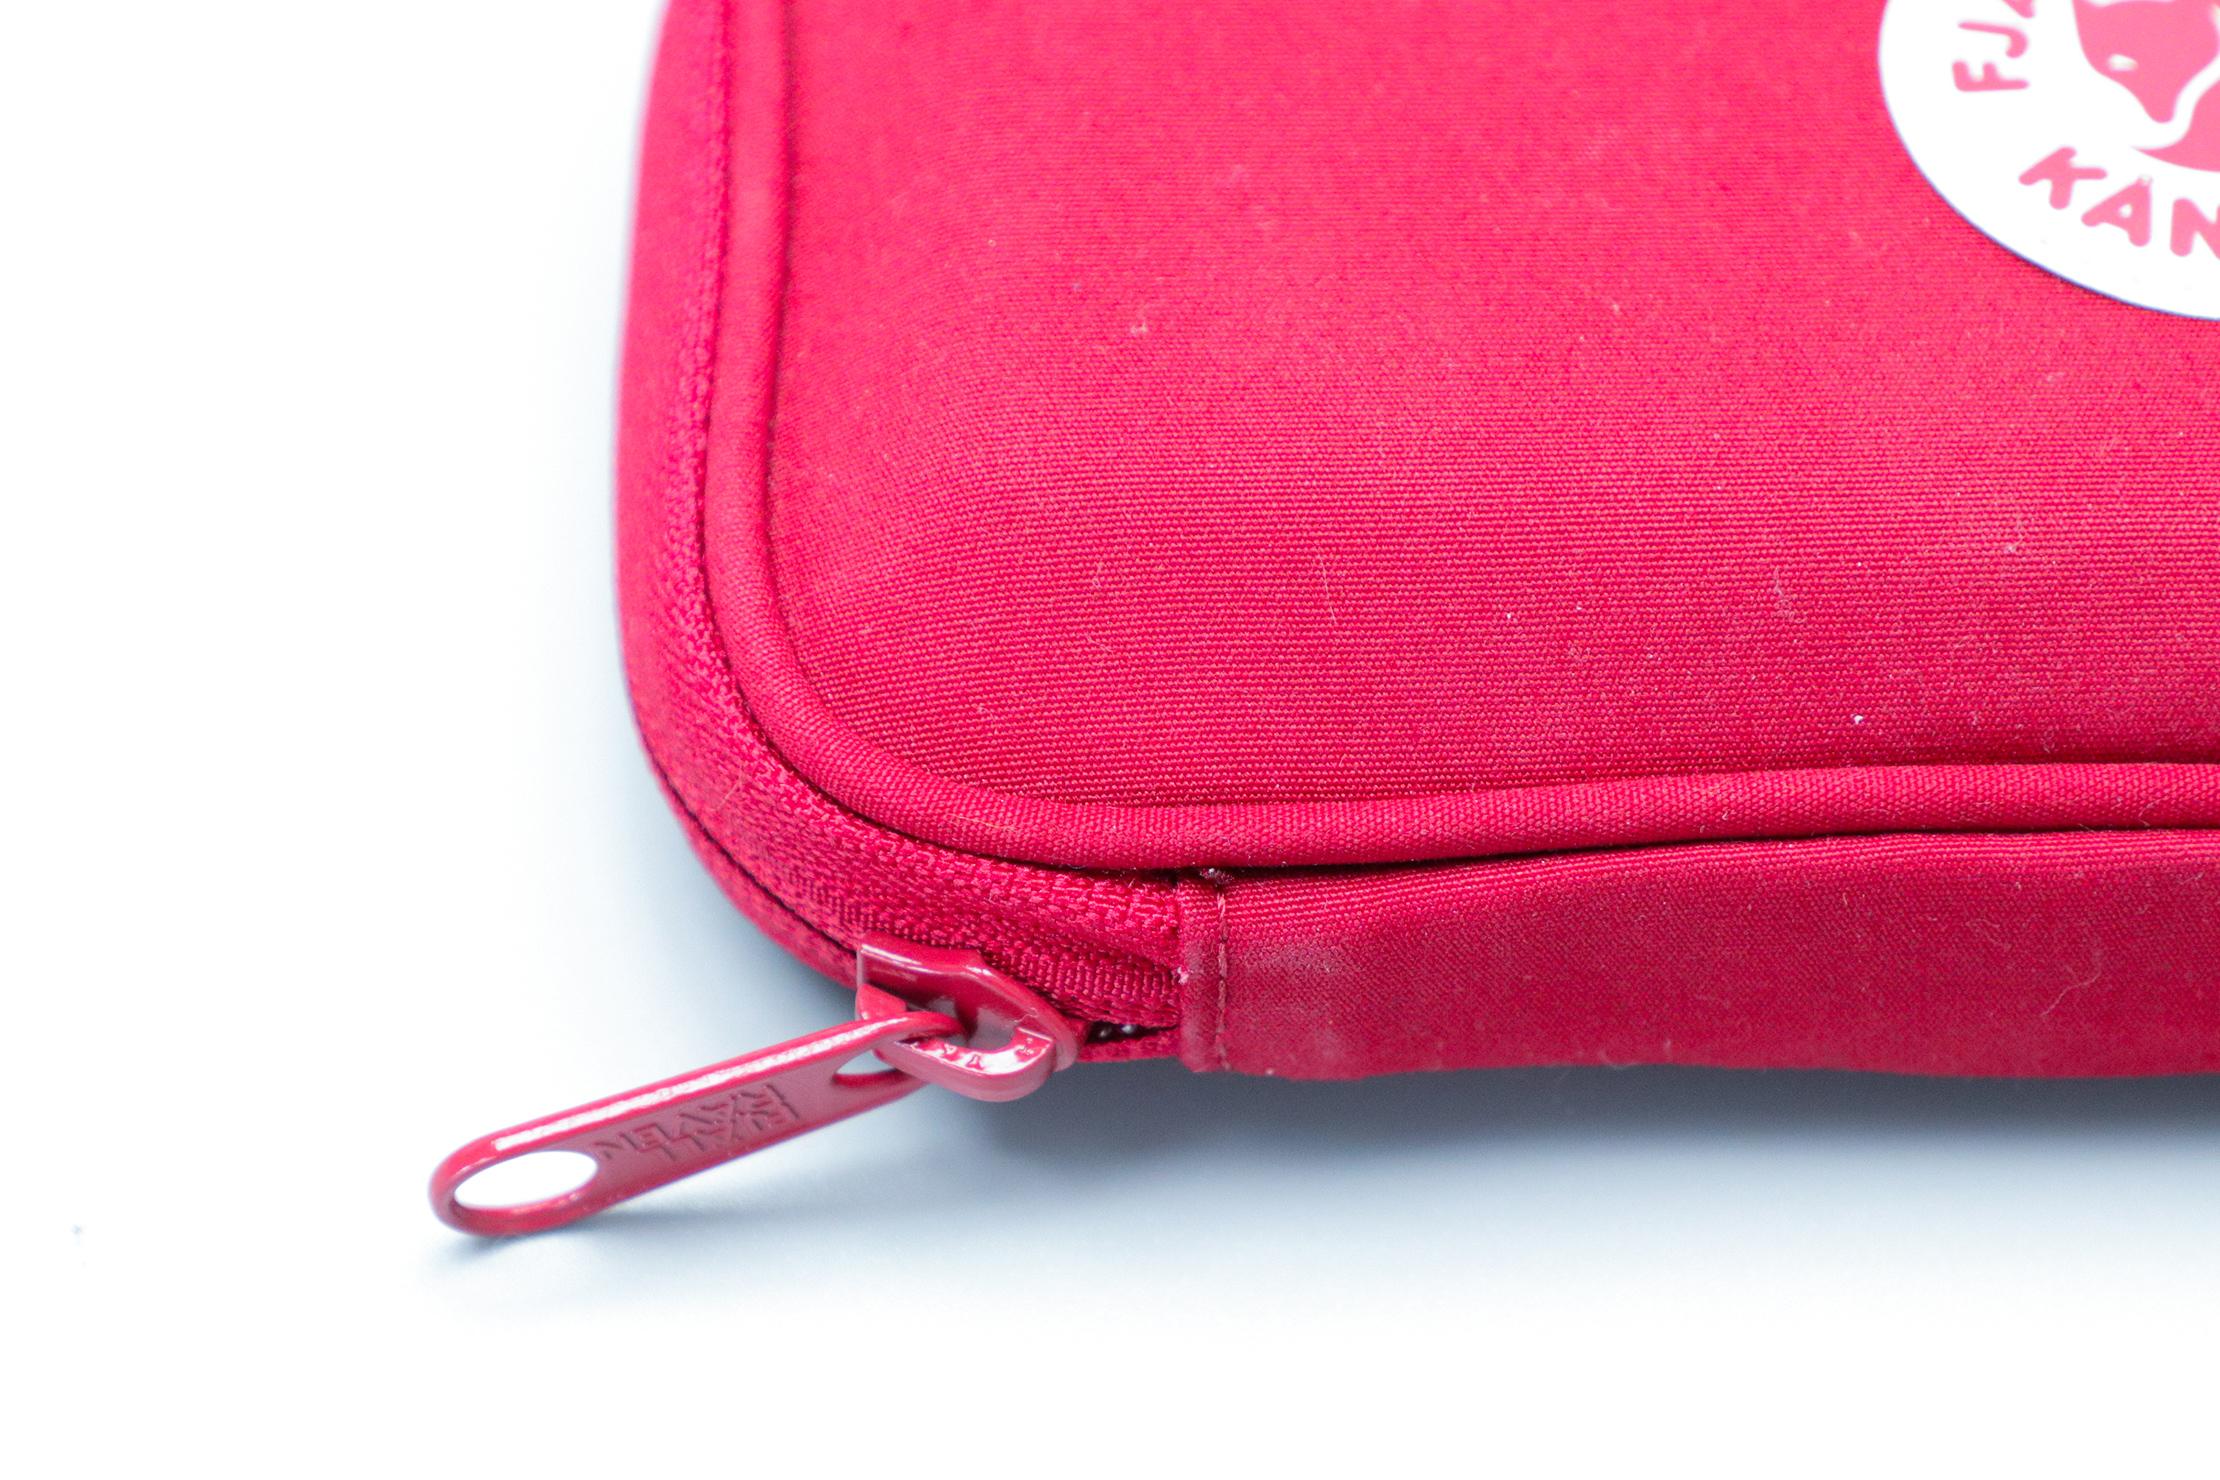 Fjallraven Kanken Travel Wallet Zipper